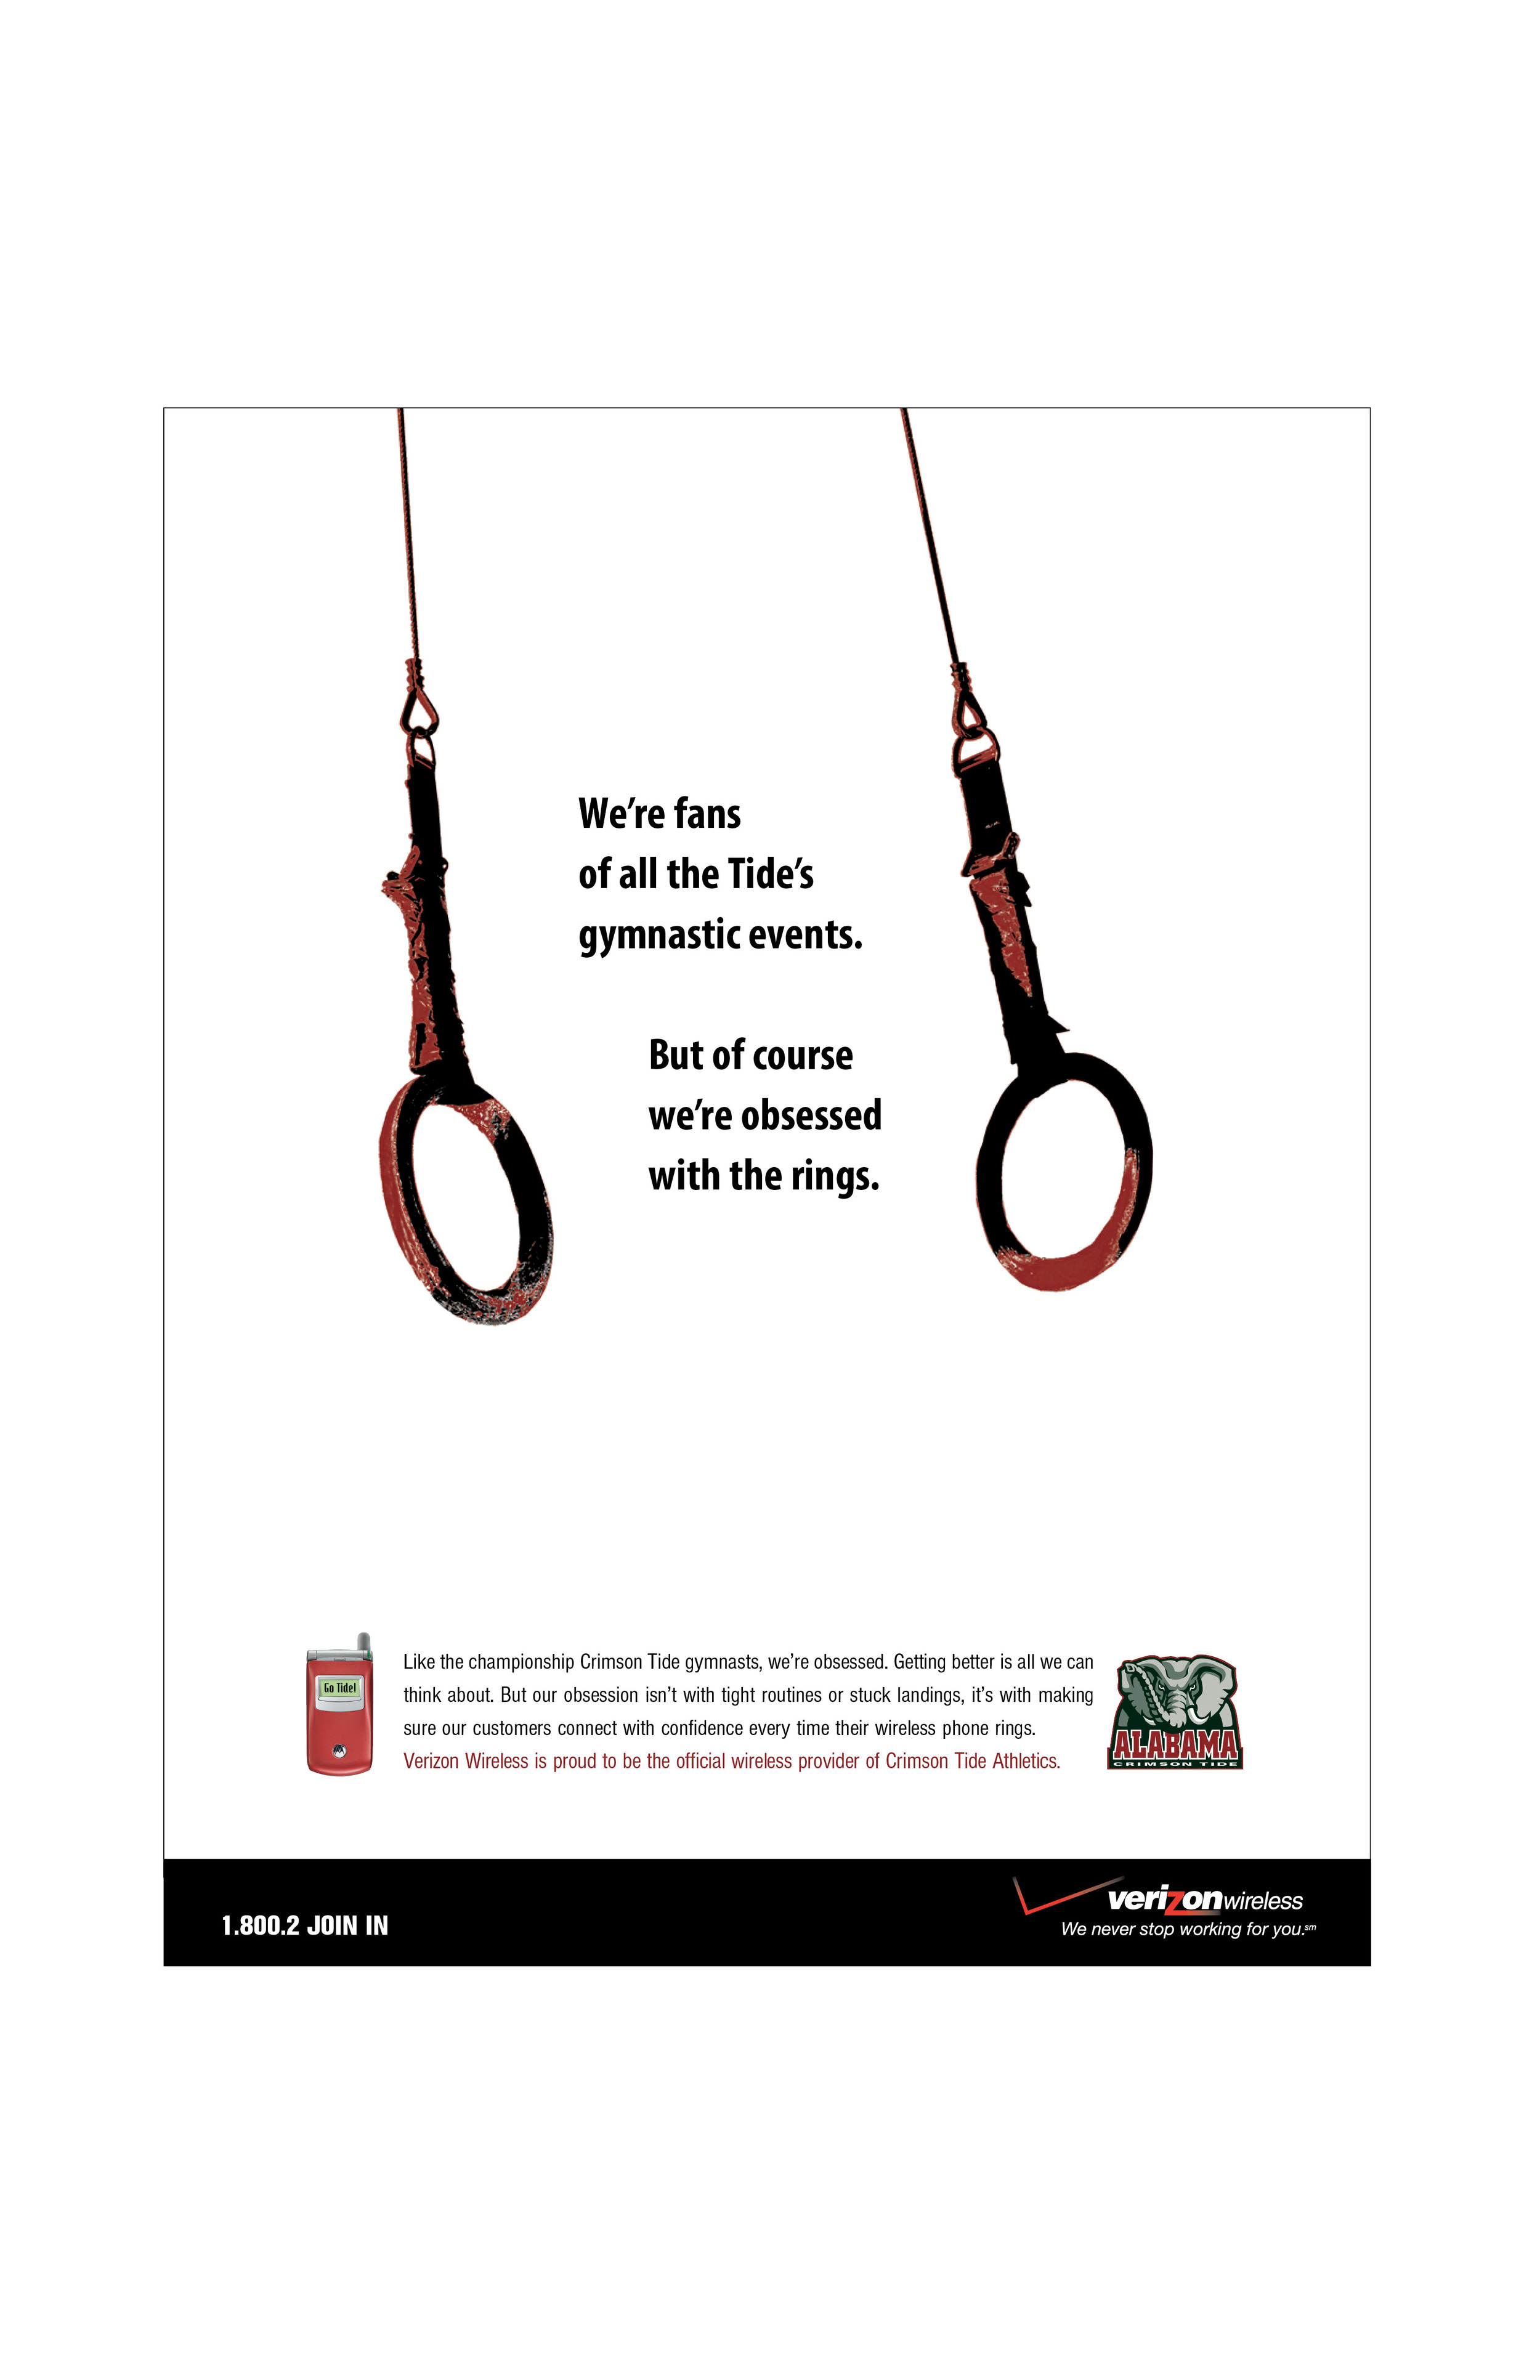 Verizon Wireless Alabama Sponsorship Ad